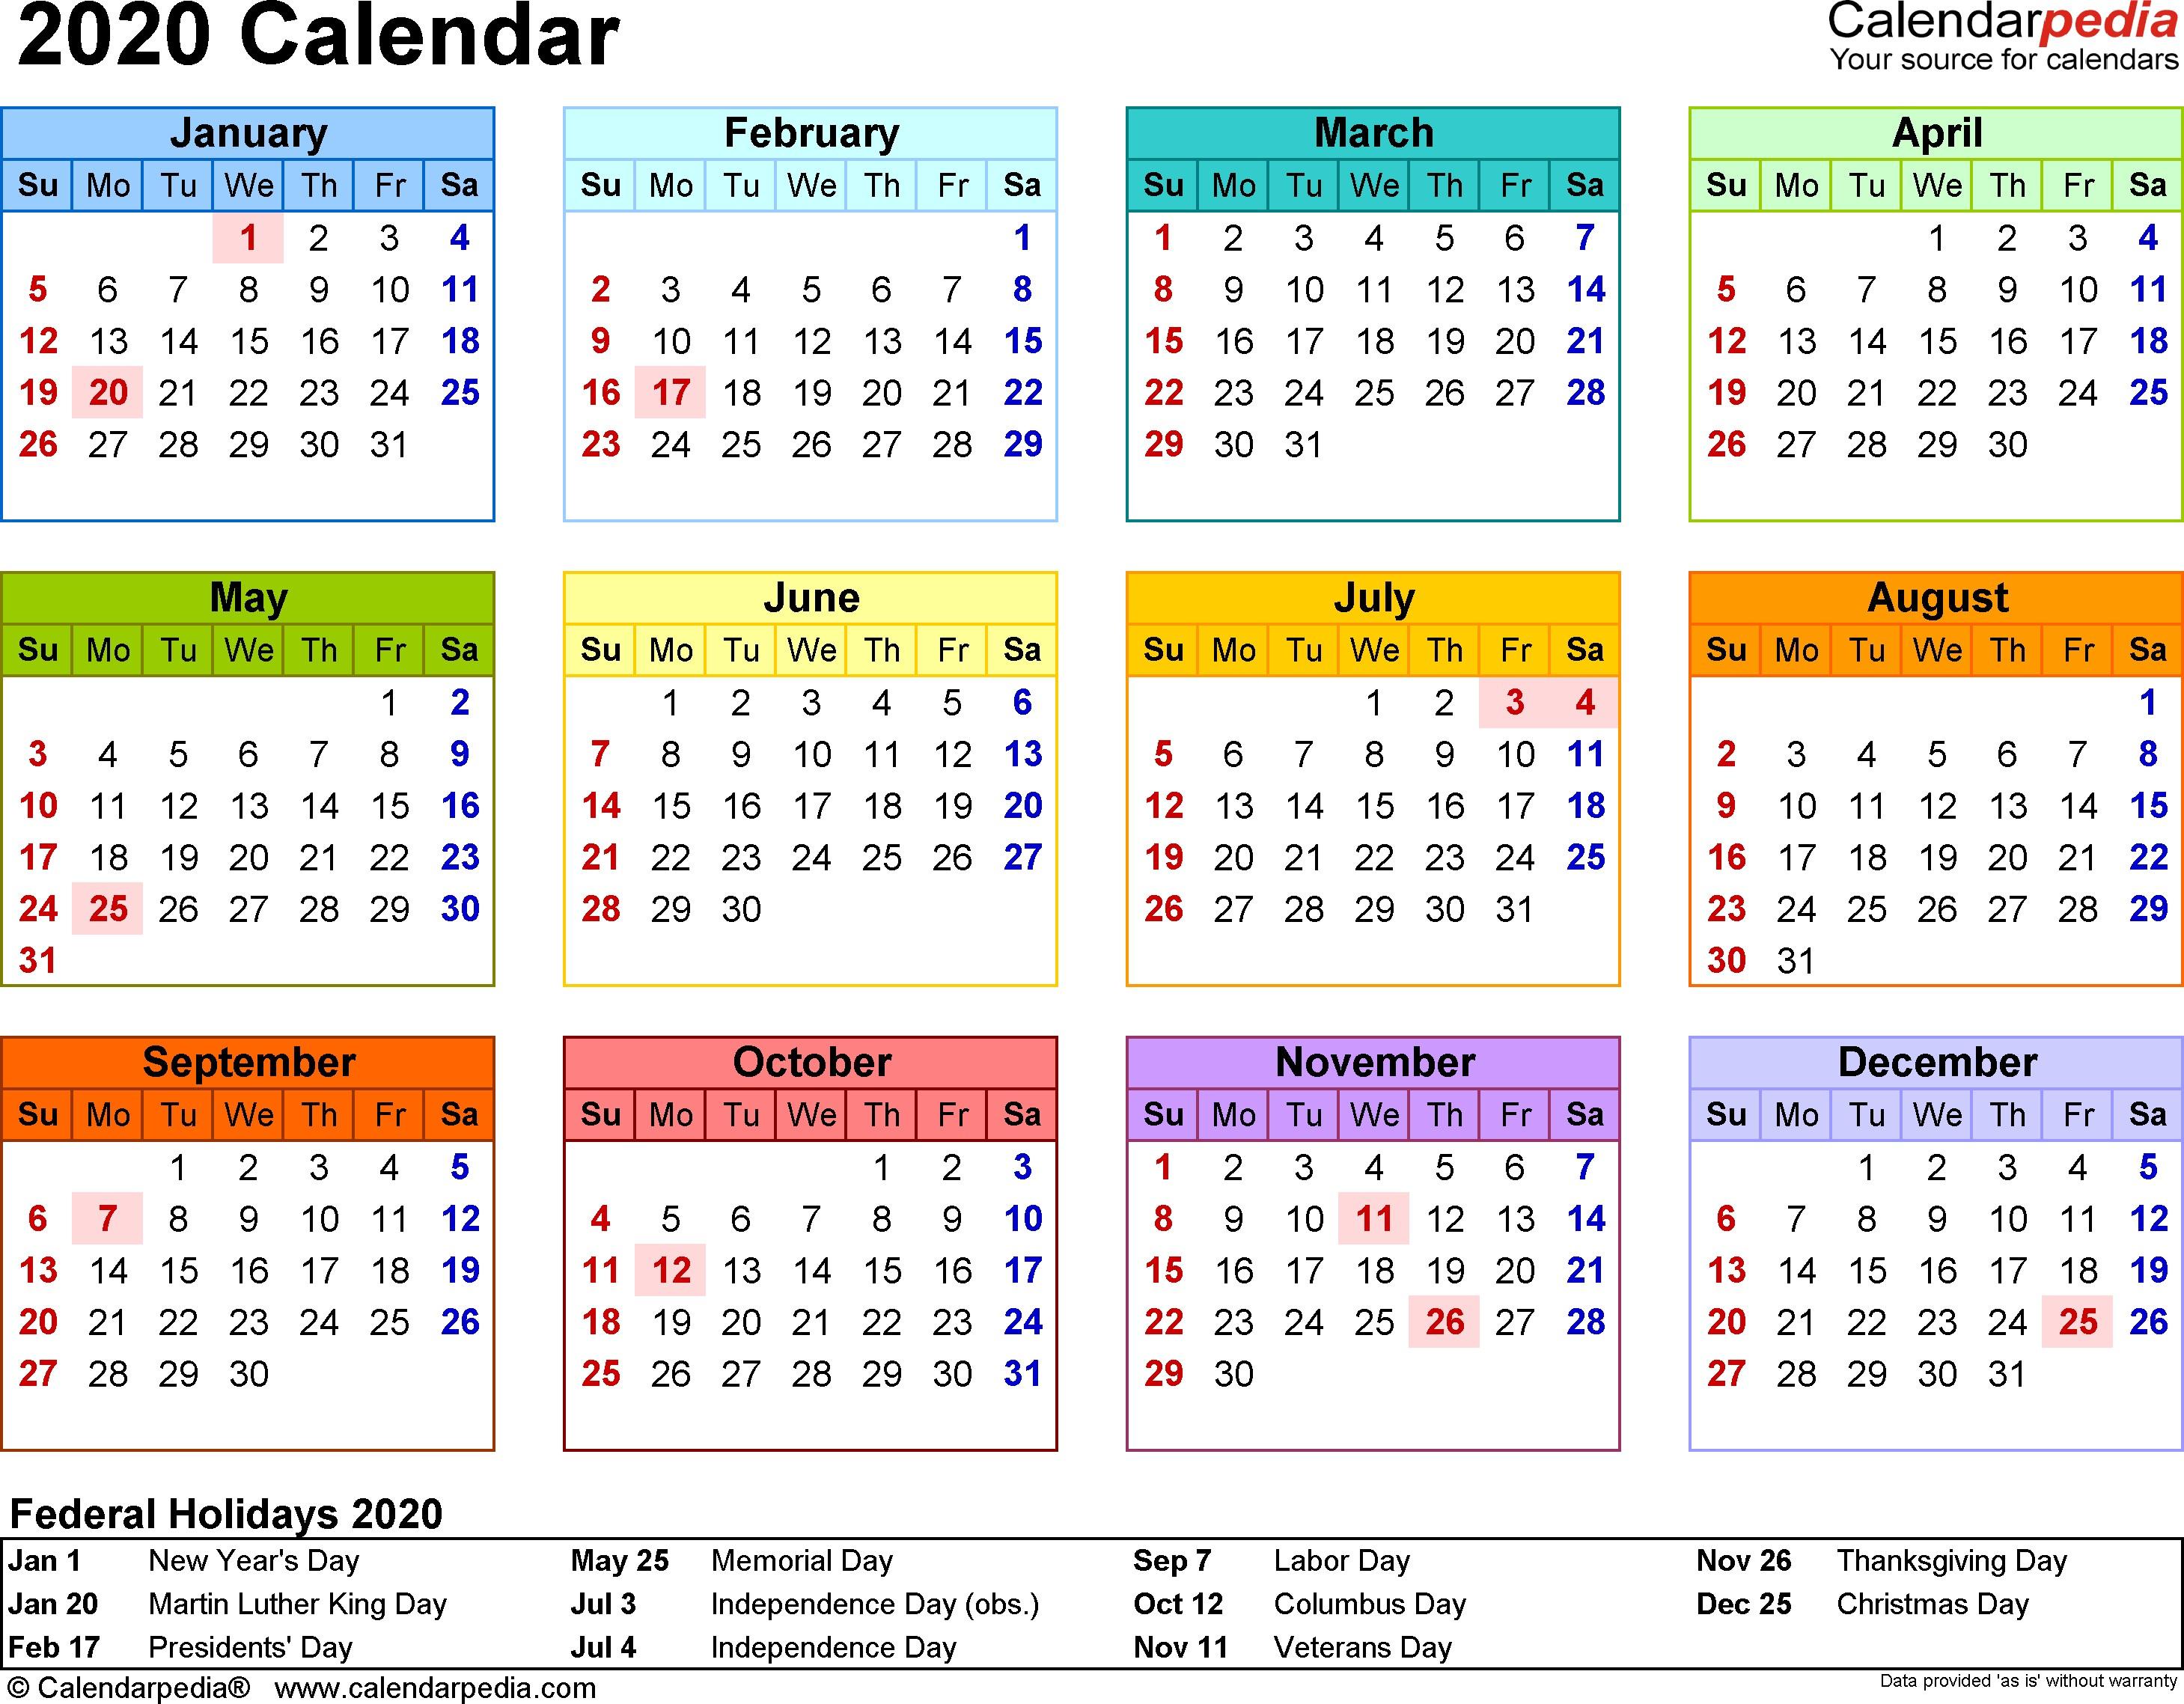 2020 Calendar PDF 17 free printable calendar templates